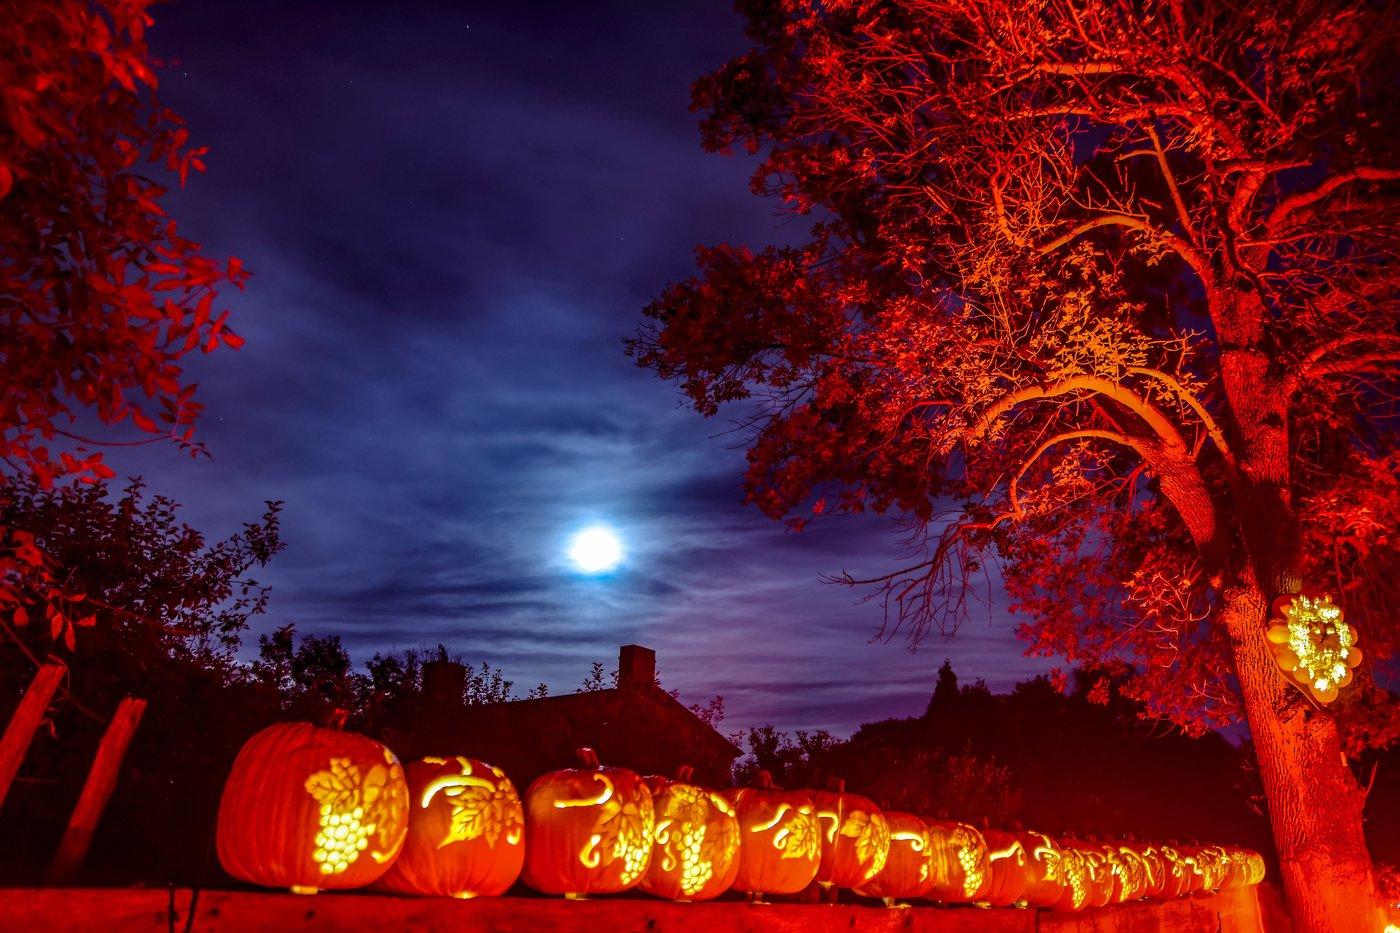 Tenth season for Pumpkinferno